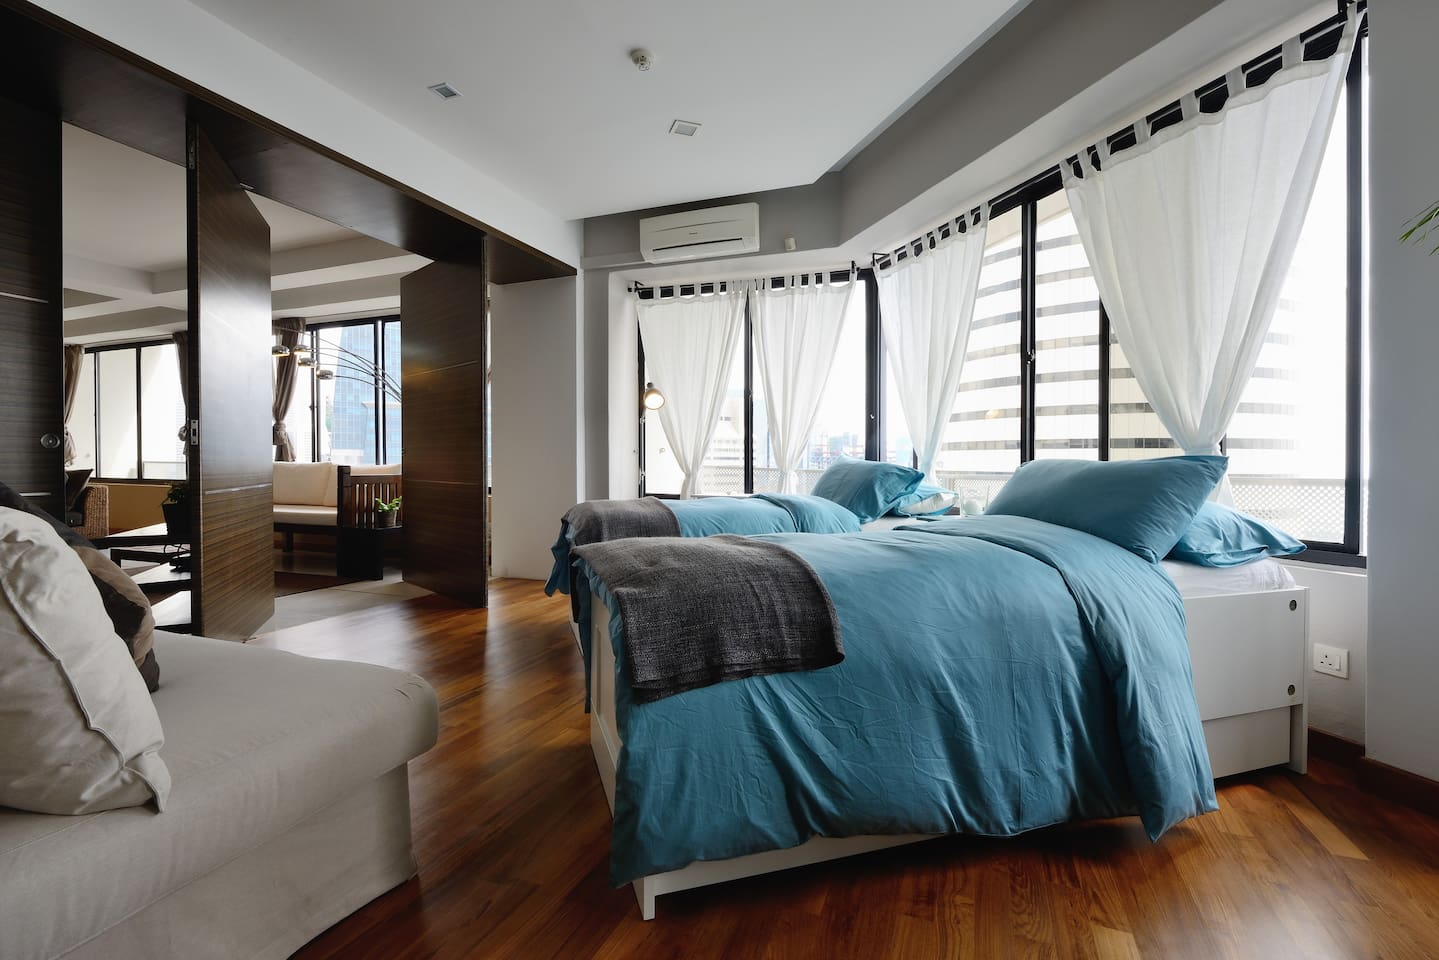 Spacious rooms and breathtaking sea views